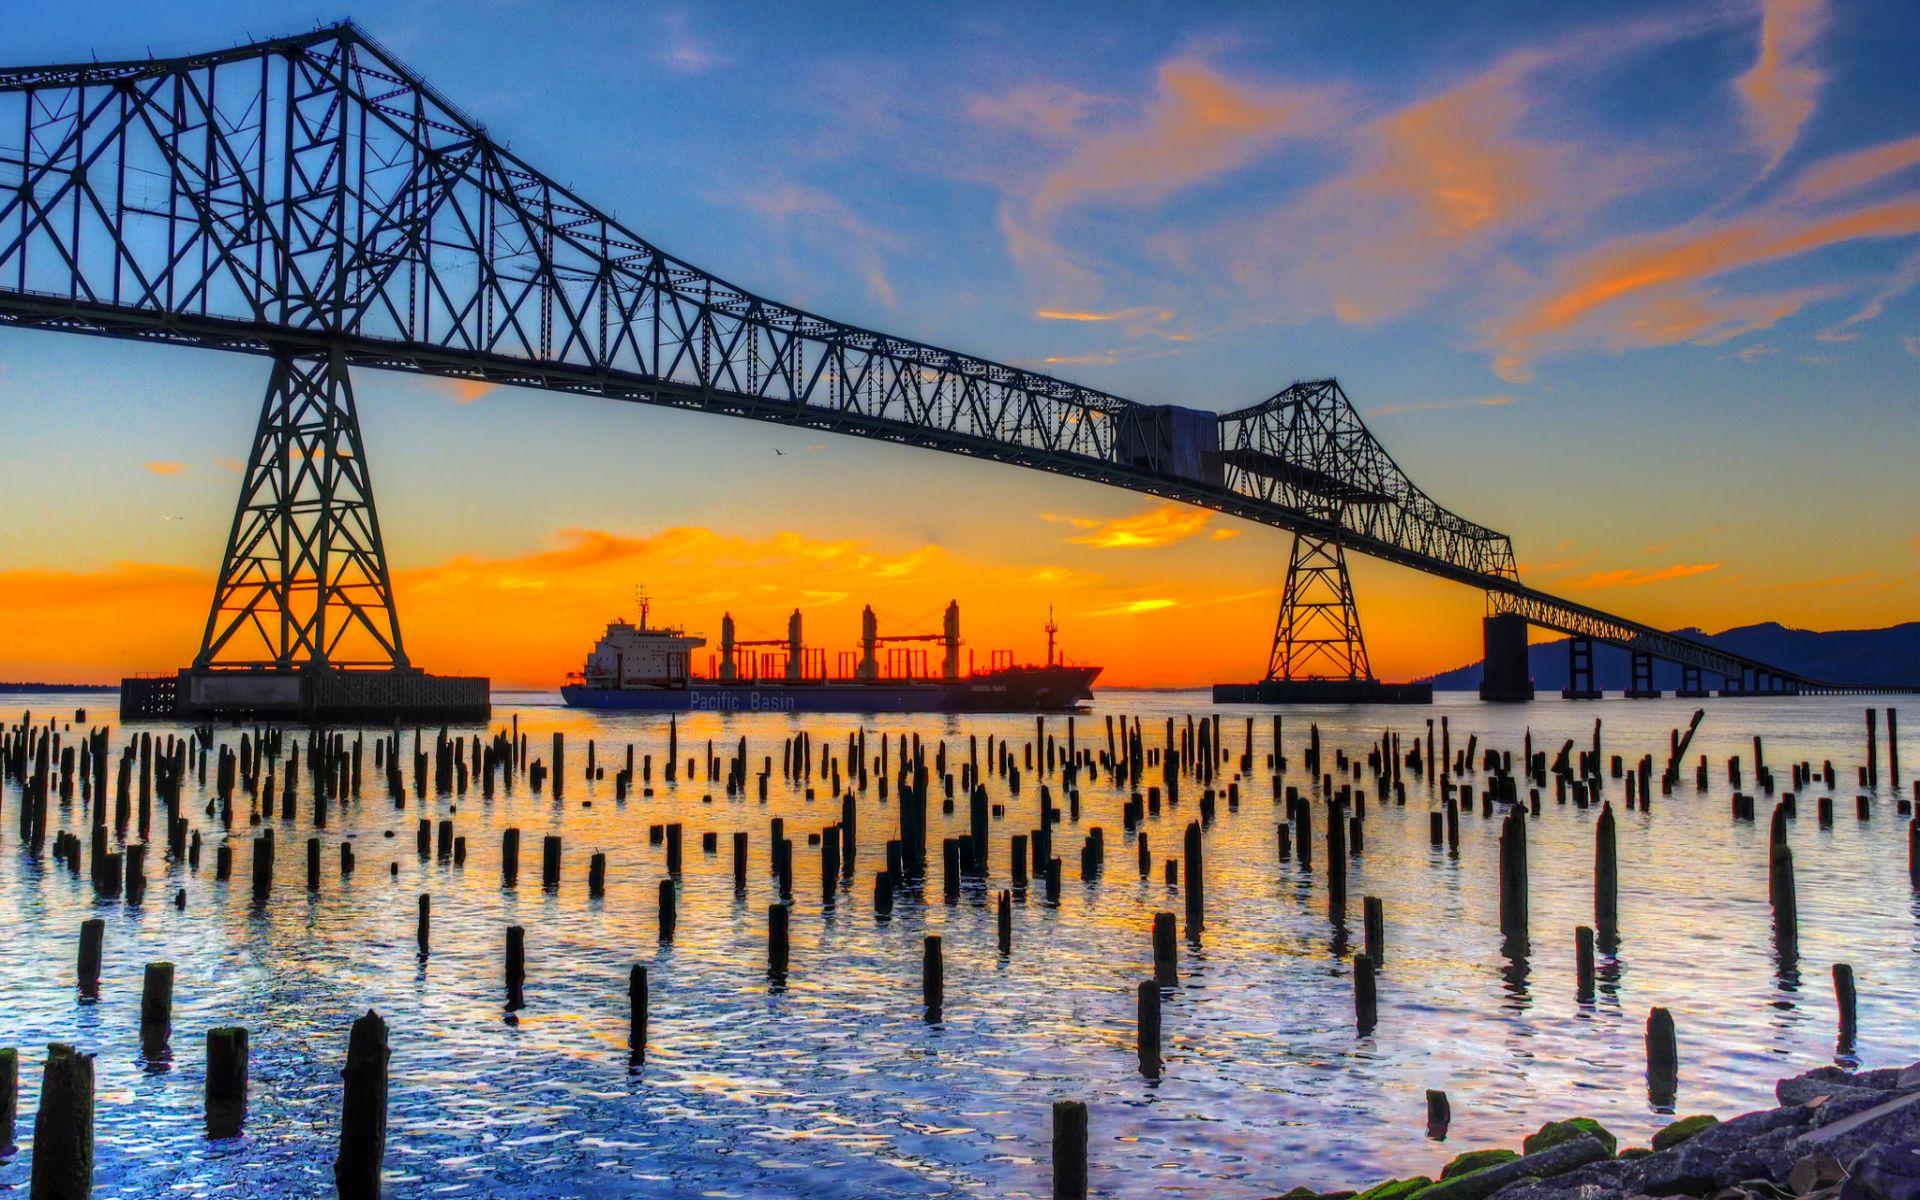 AstoriaMegler Bridge HD Wallpaper Background Image 1920x1200 1920x1200